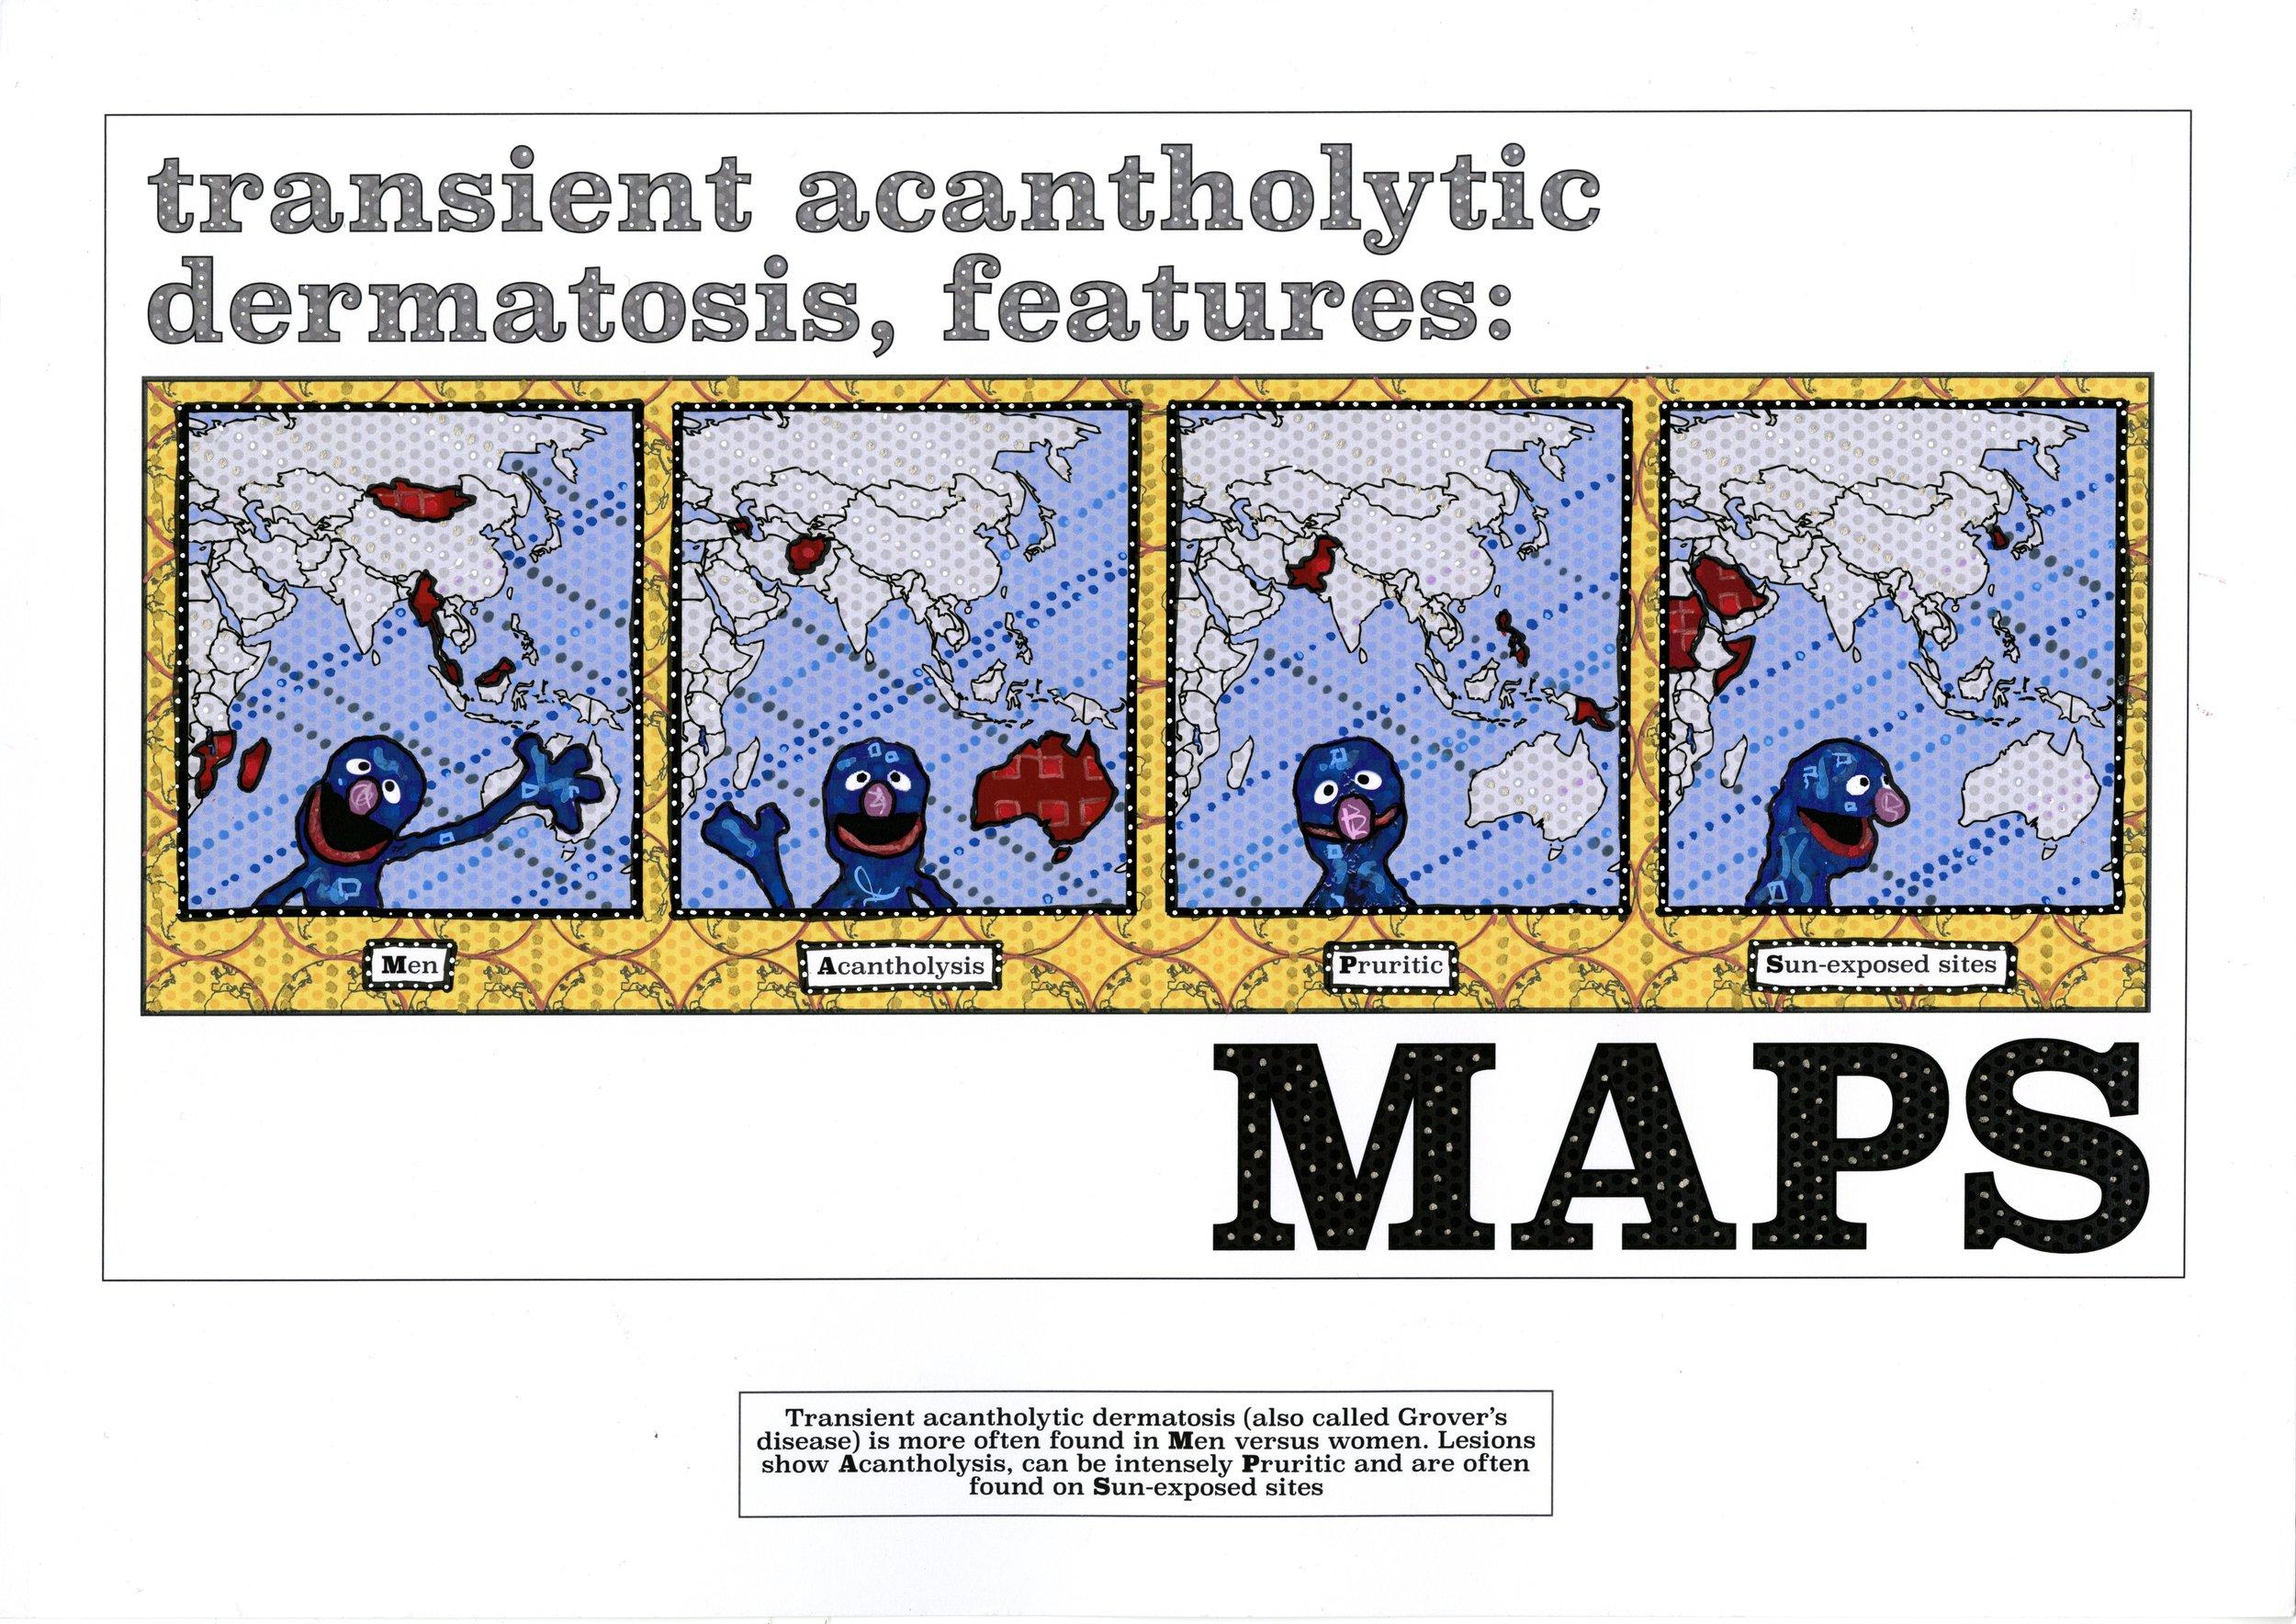 14 MAPS.jpg